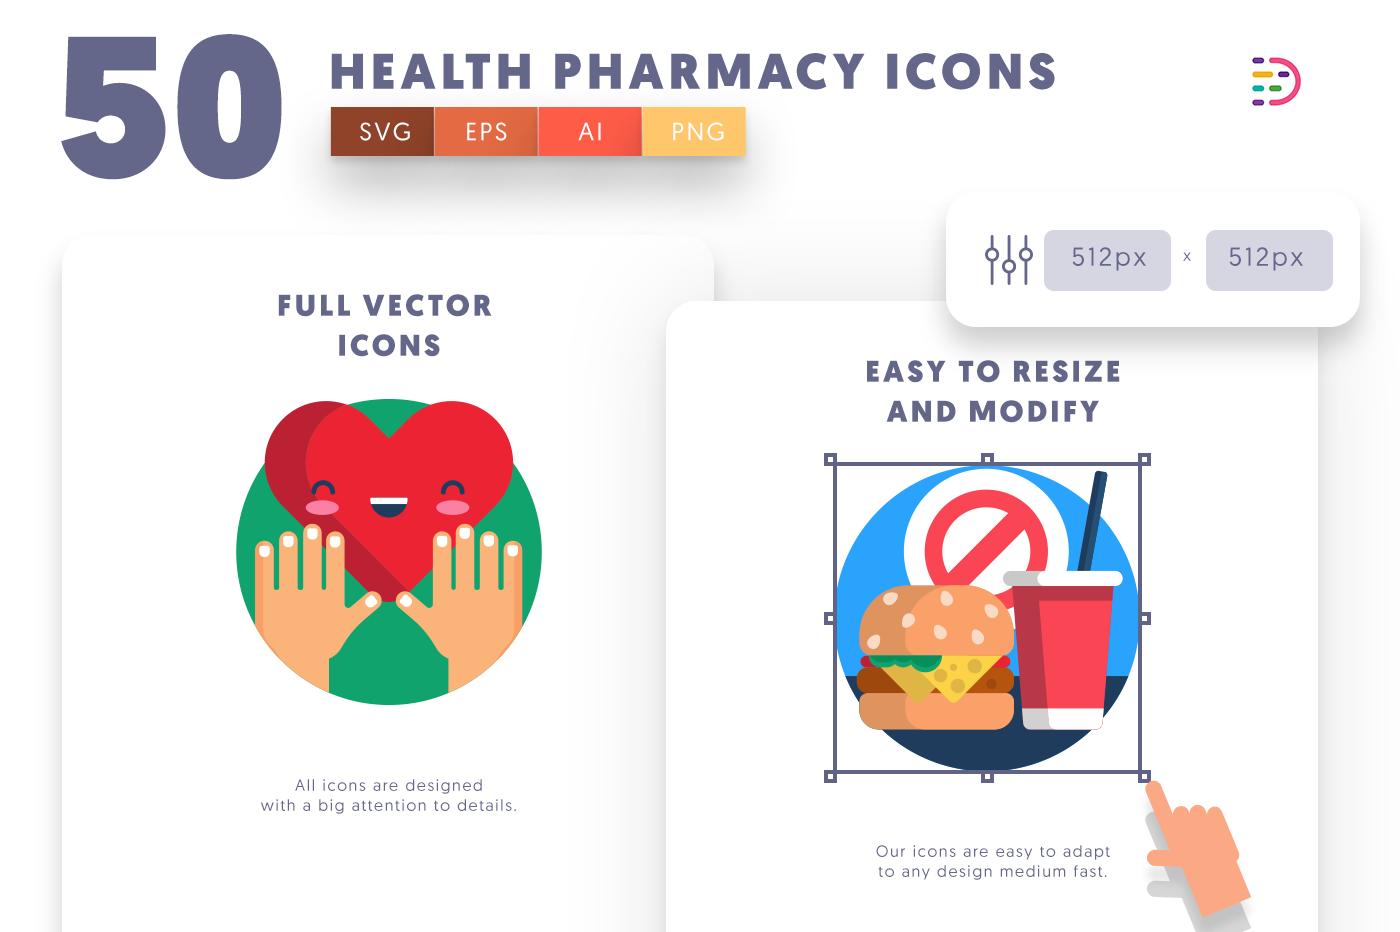 Customizable and vector 50 Health Pharmacy Icons